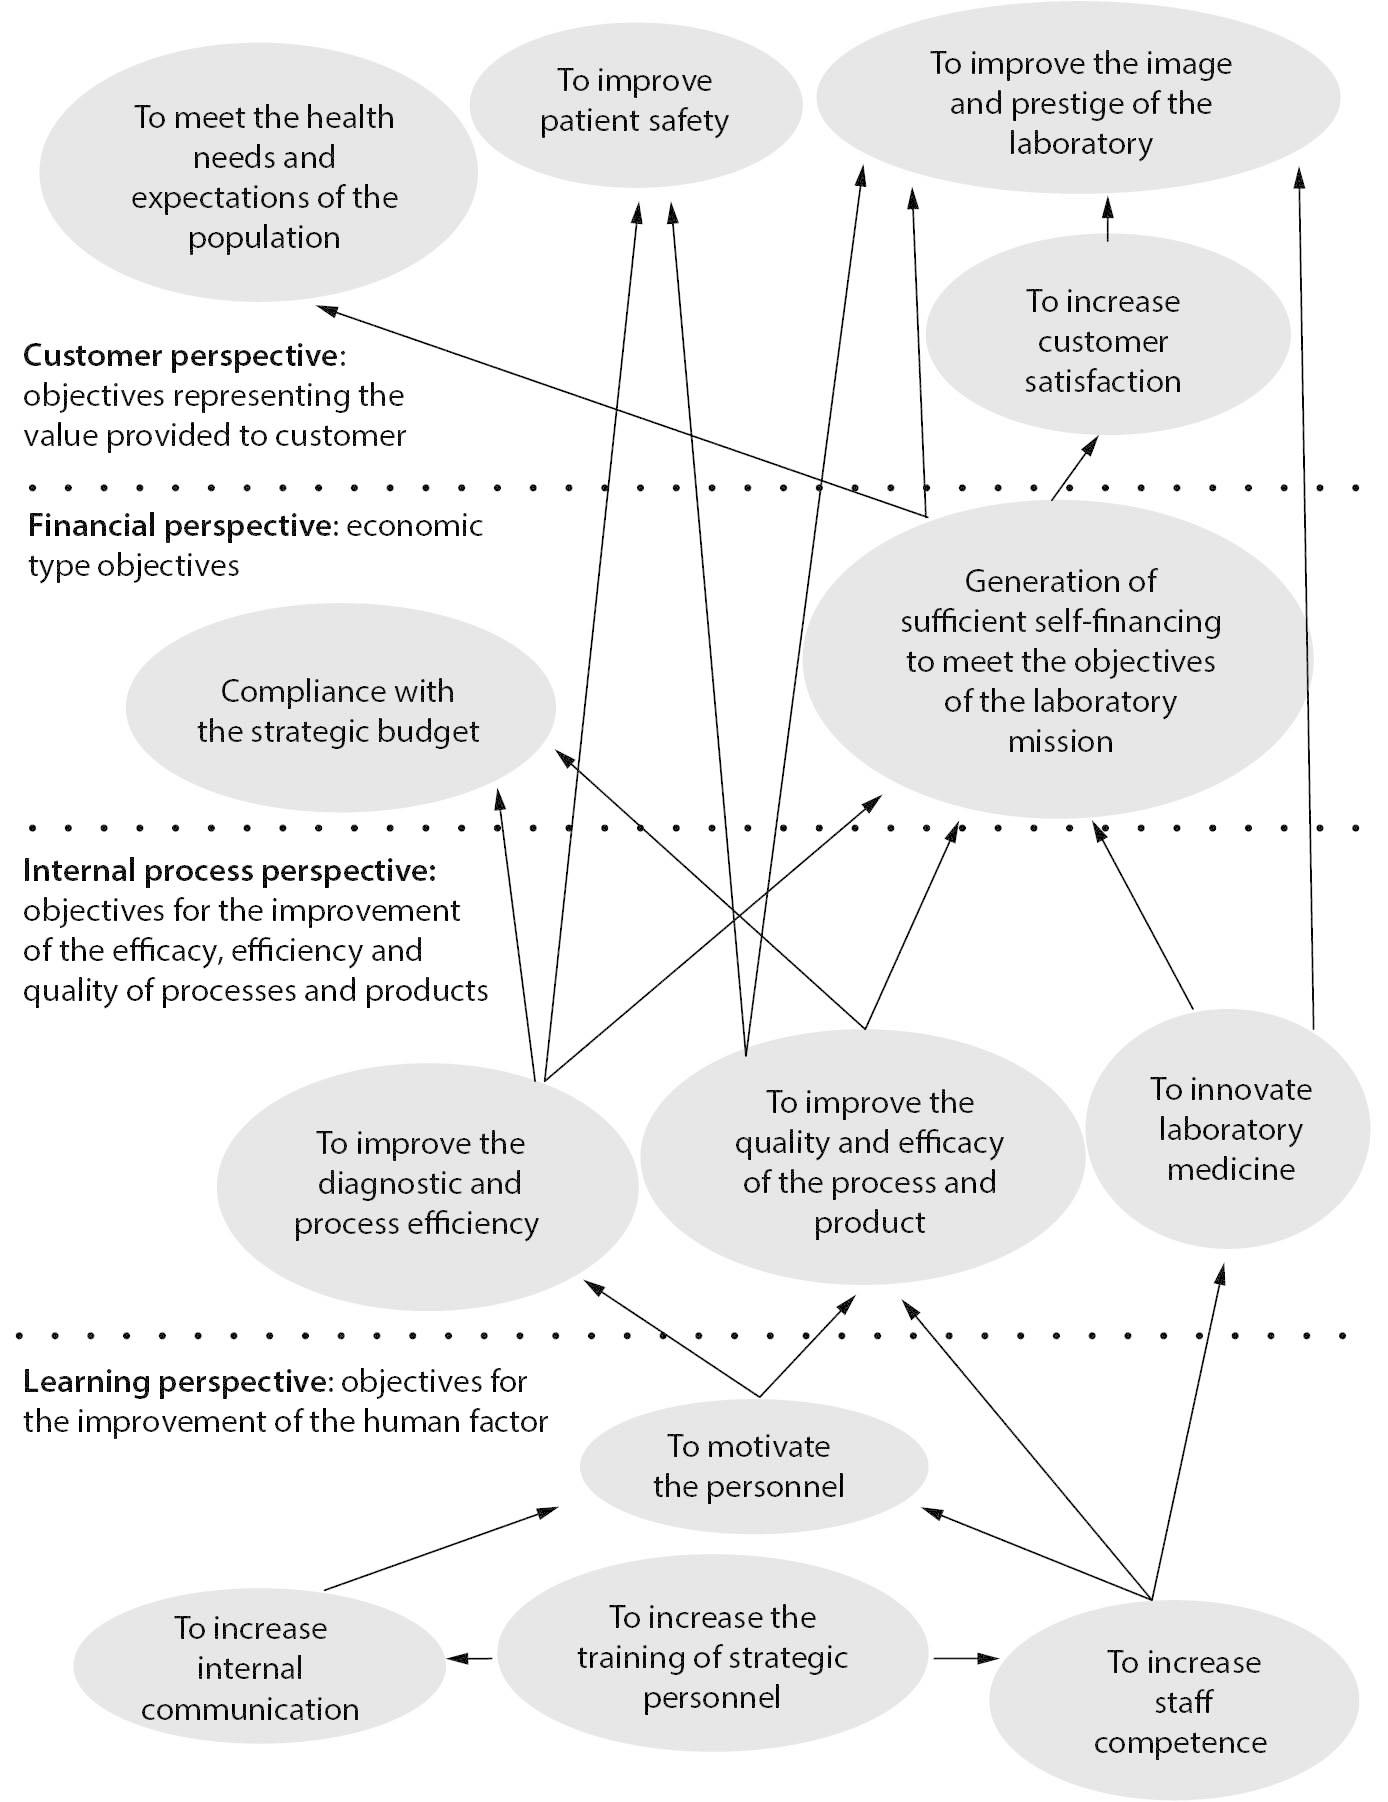 A balanced scorecard for assessing a strategic plan in a